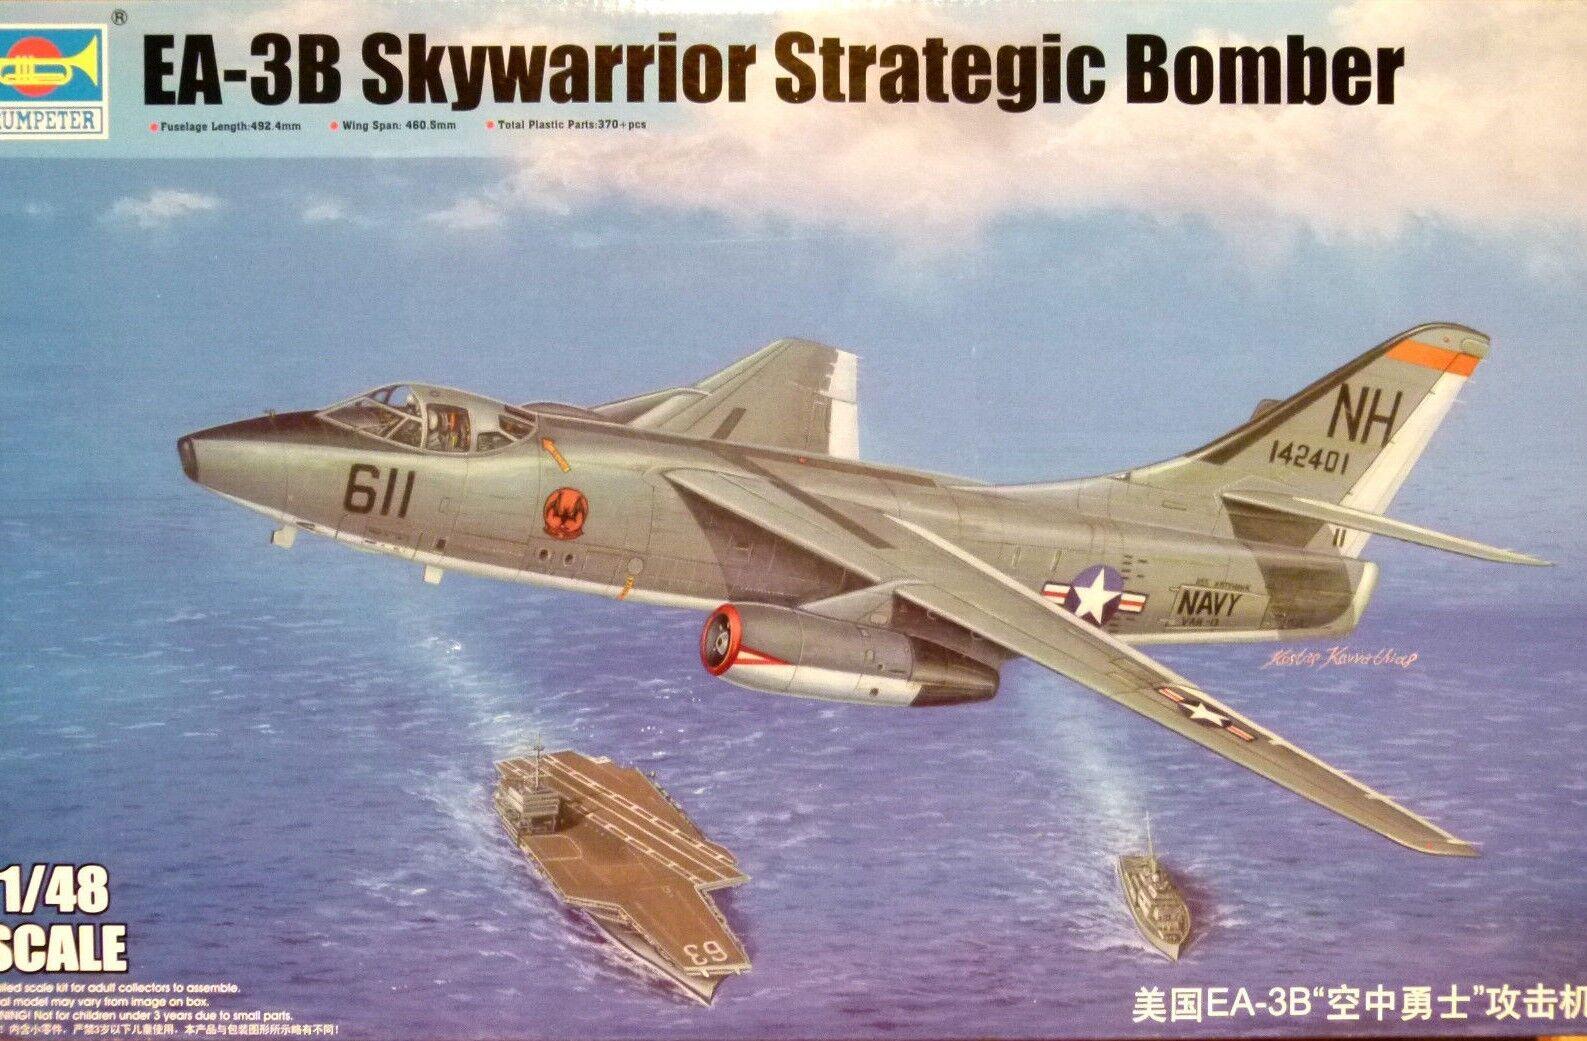 Trumpeter 1 48 Douglas EA-3B Skywarrior Strategic Bomber Aircraft Model Kit